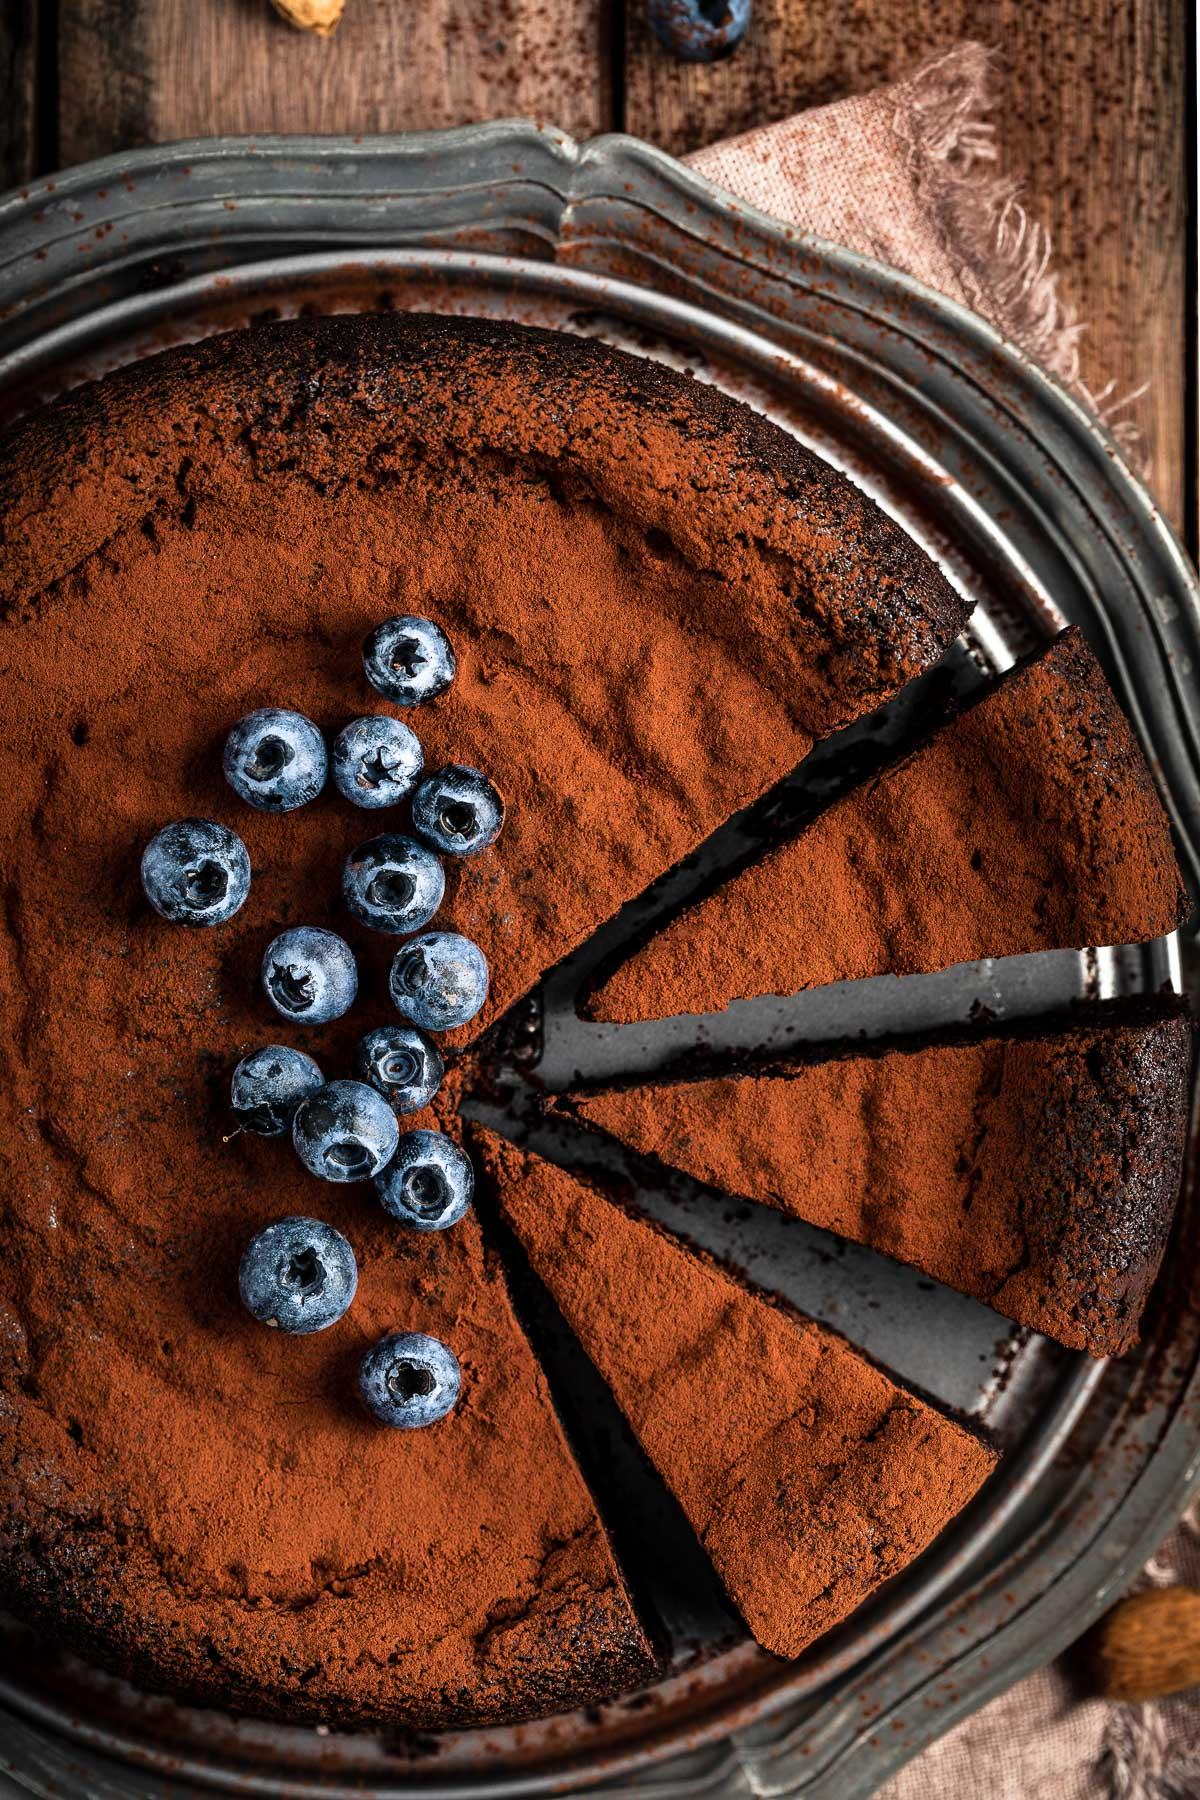 Torta al cioccolato e mandorle vegan senza glutine senza farina gluten free flourless vegan chocolate cake #paleo